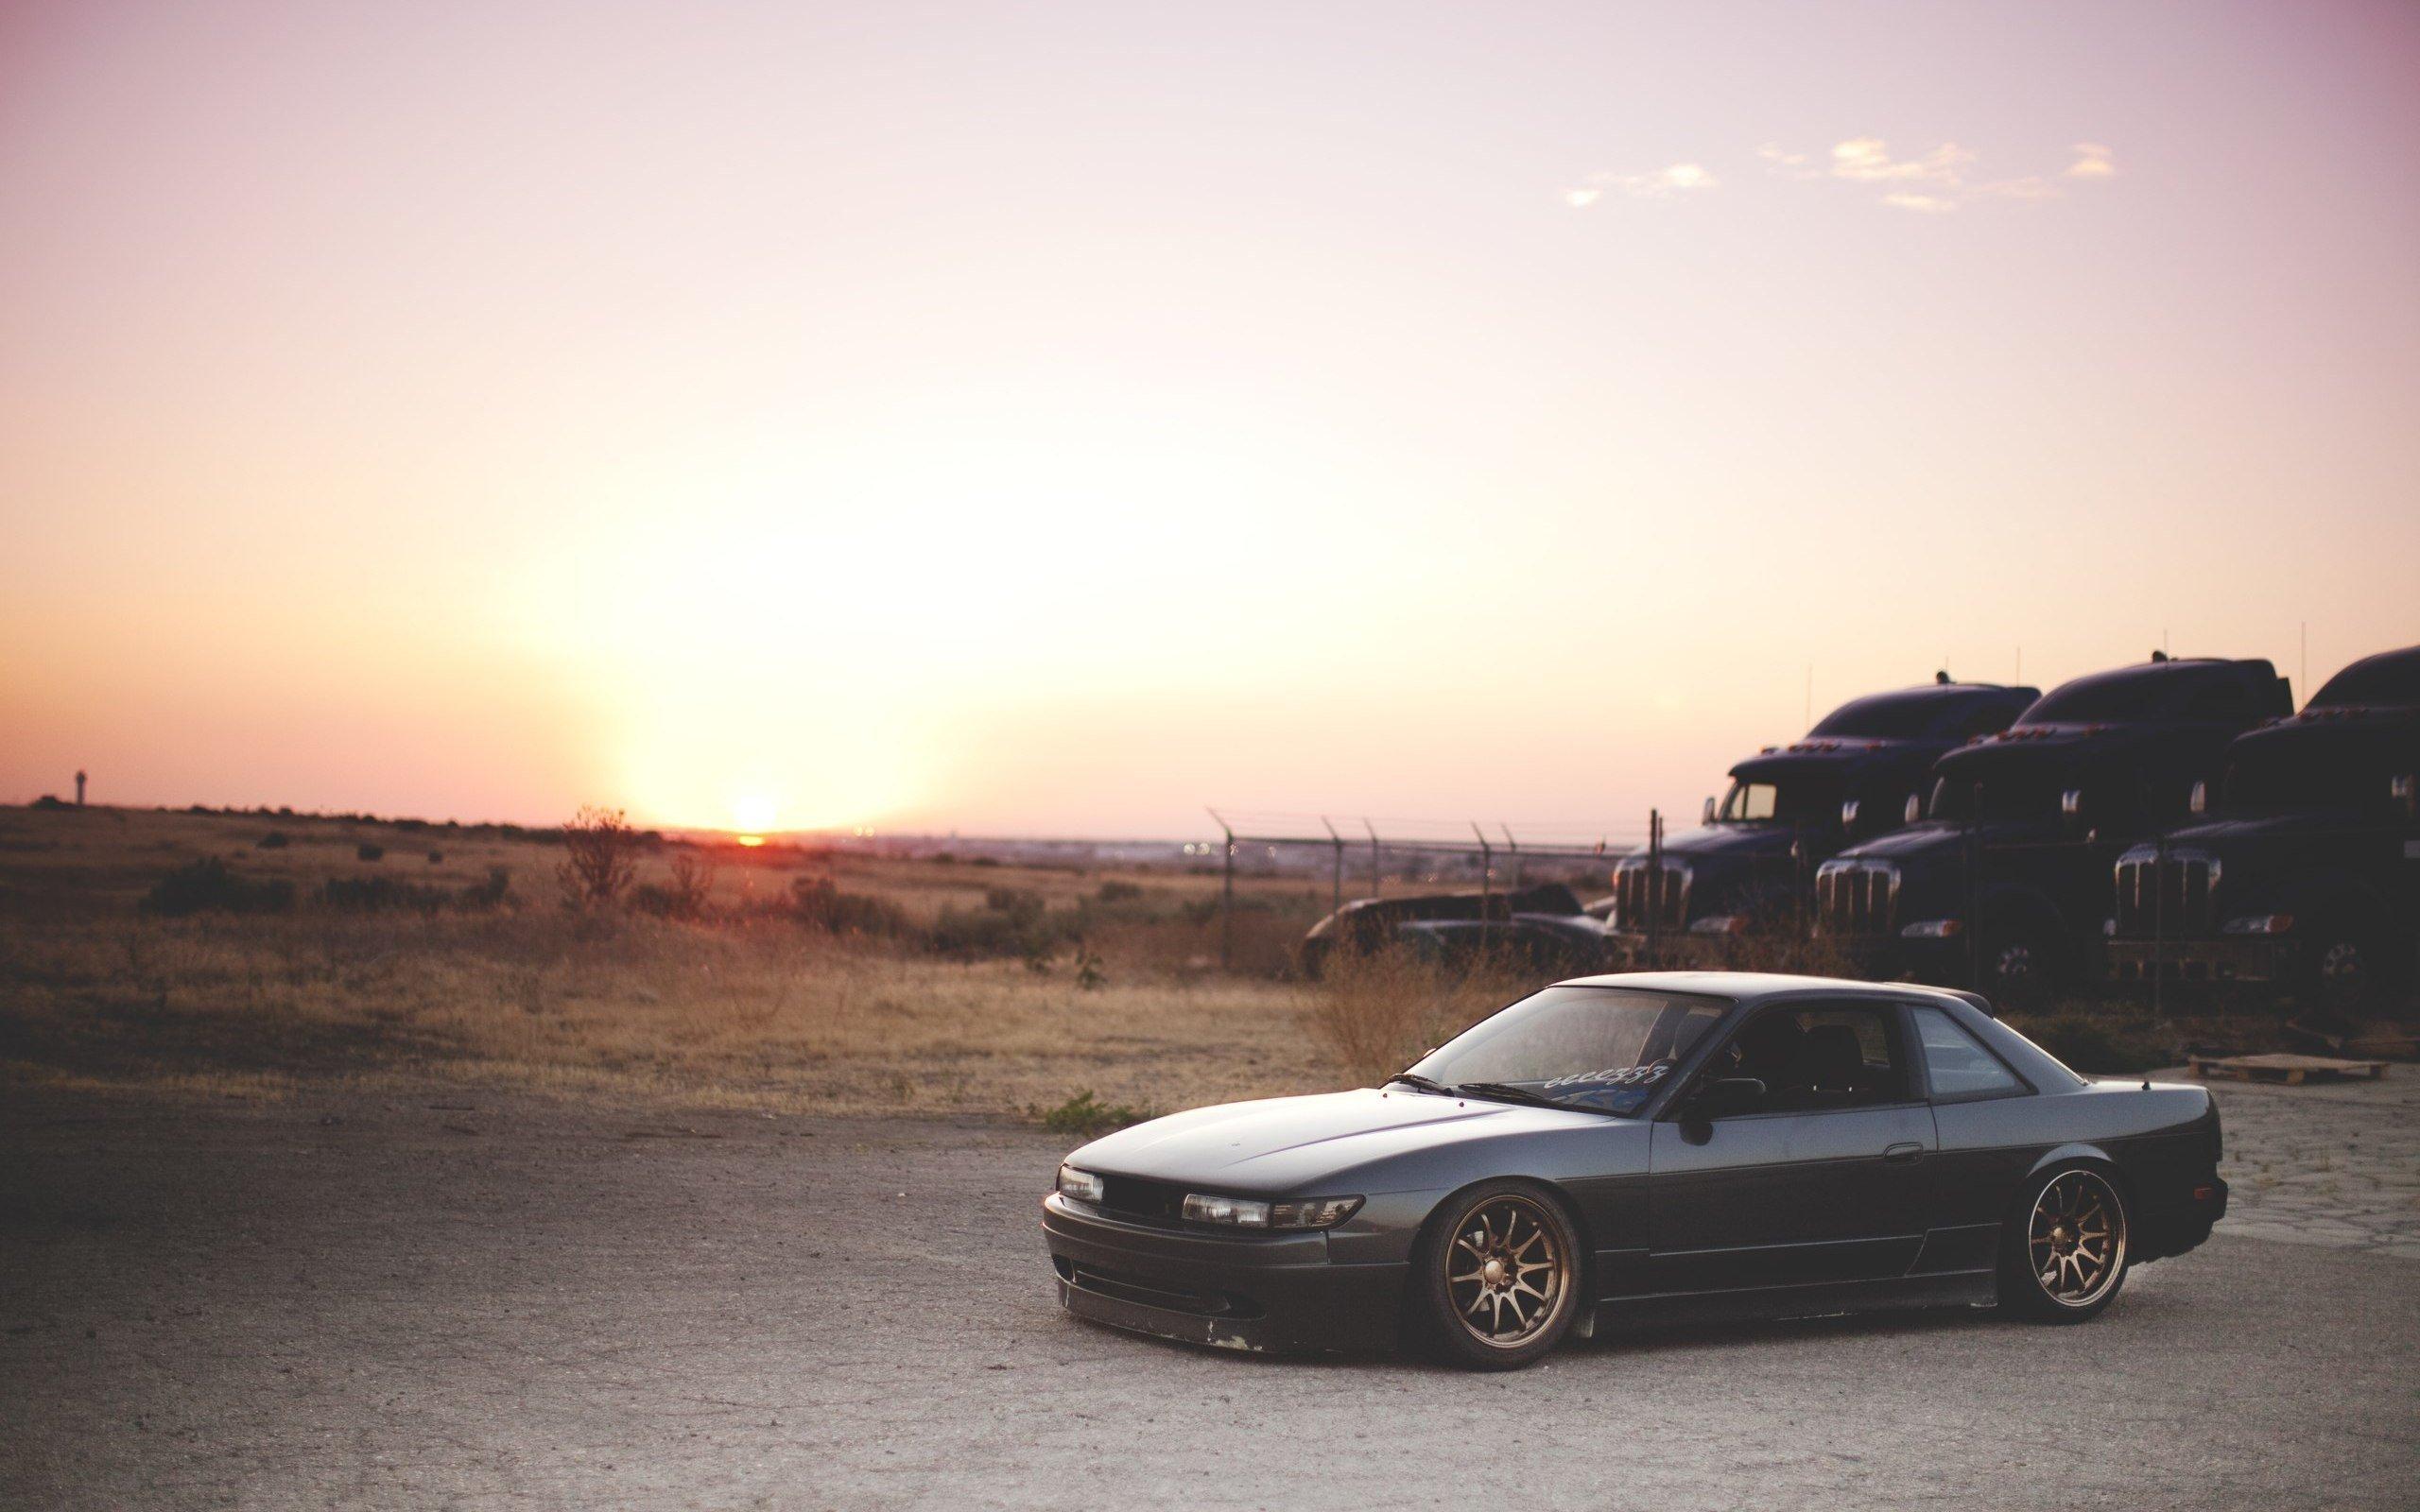 Jdm Car Wallpaper 1920x1080 Cars Nissan Vehicles Nissan Silvia Nissan Silvia S13